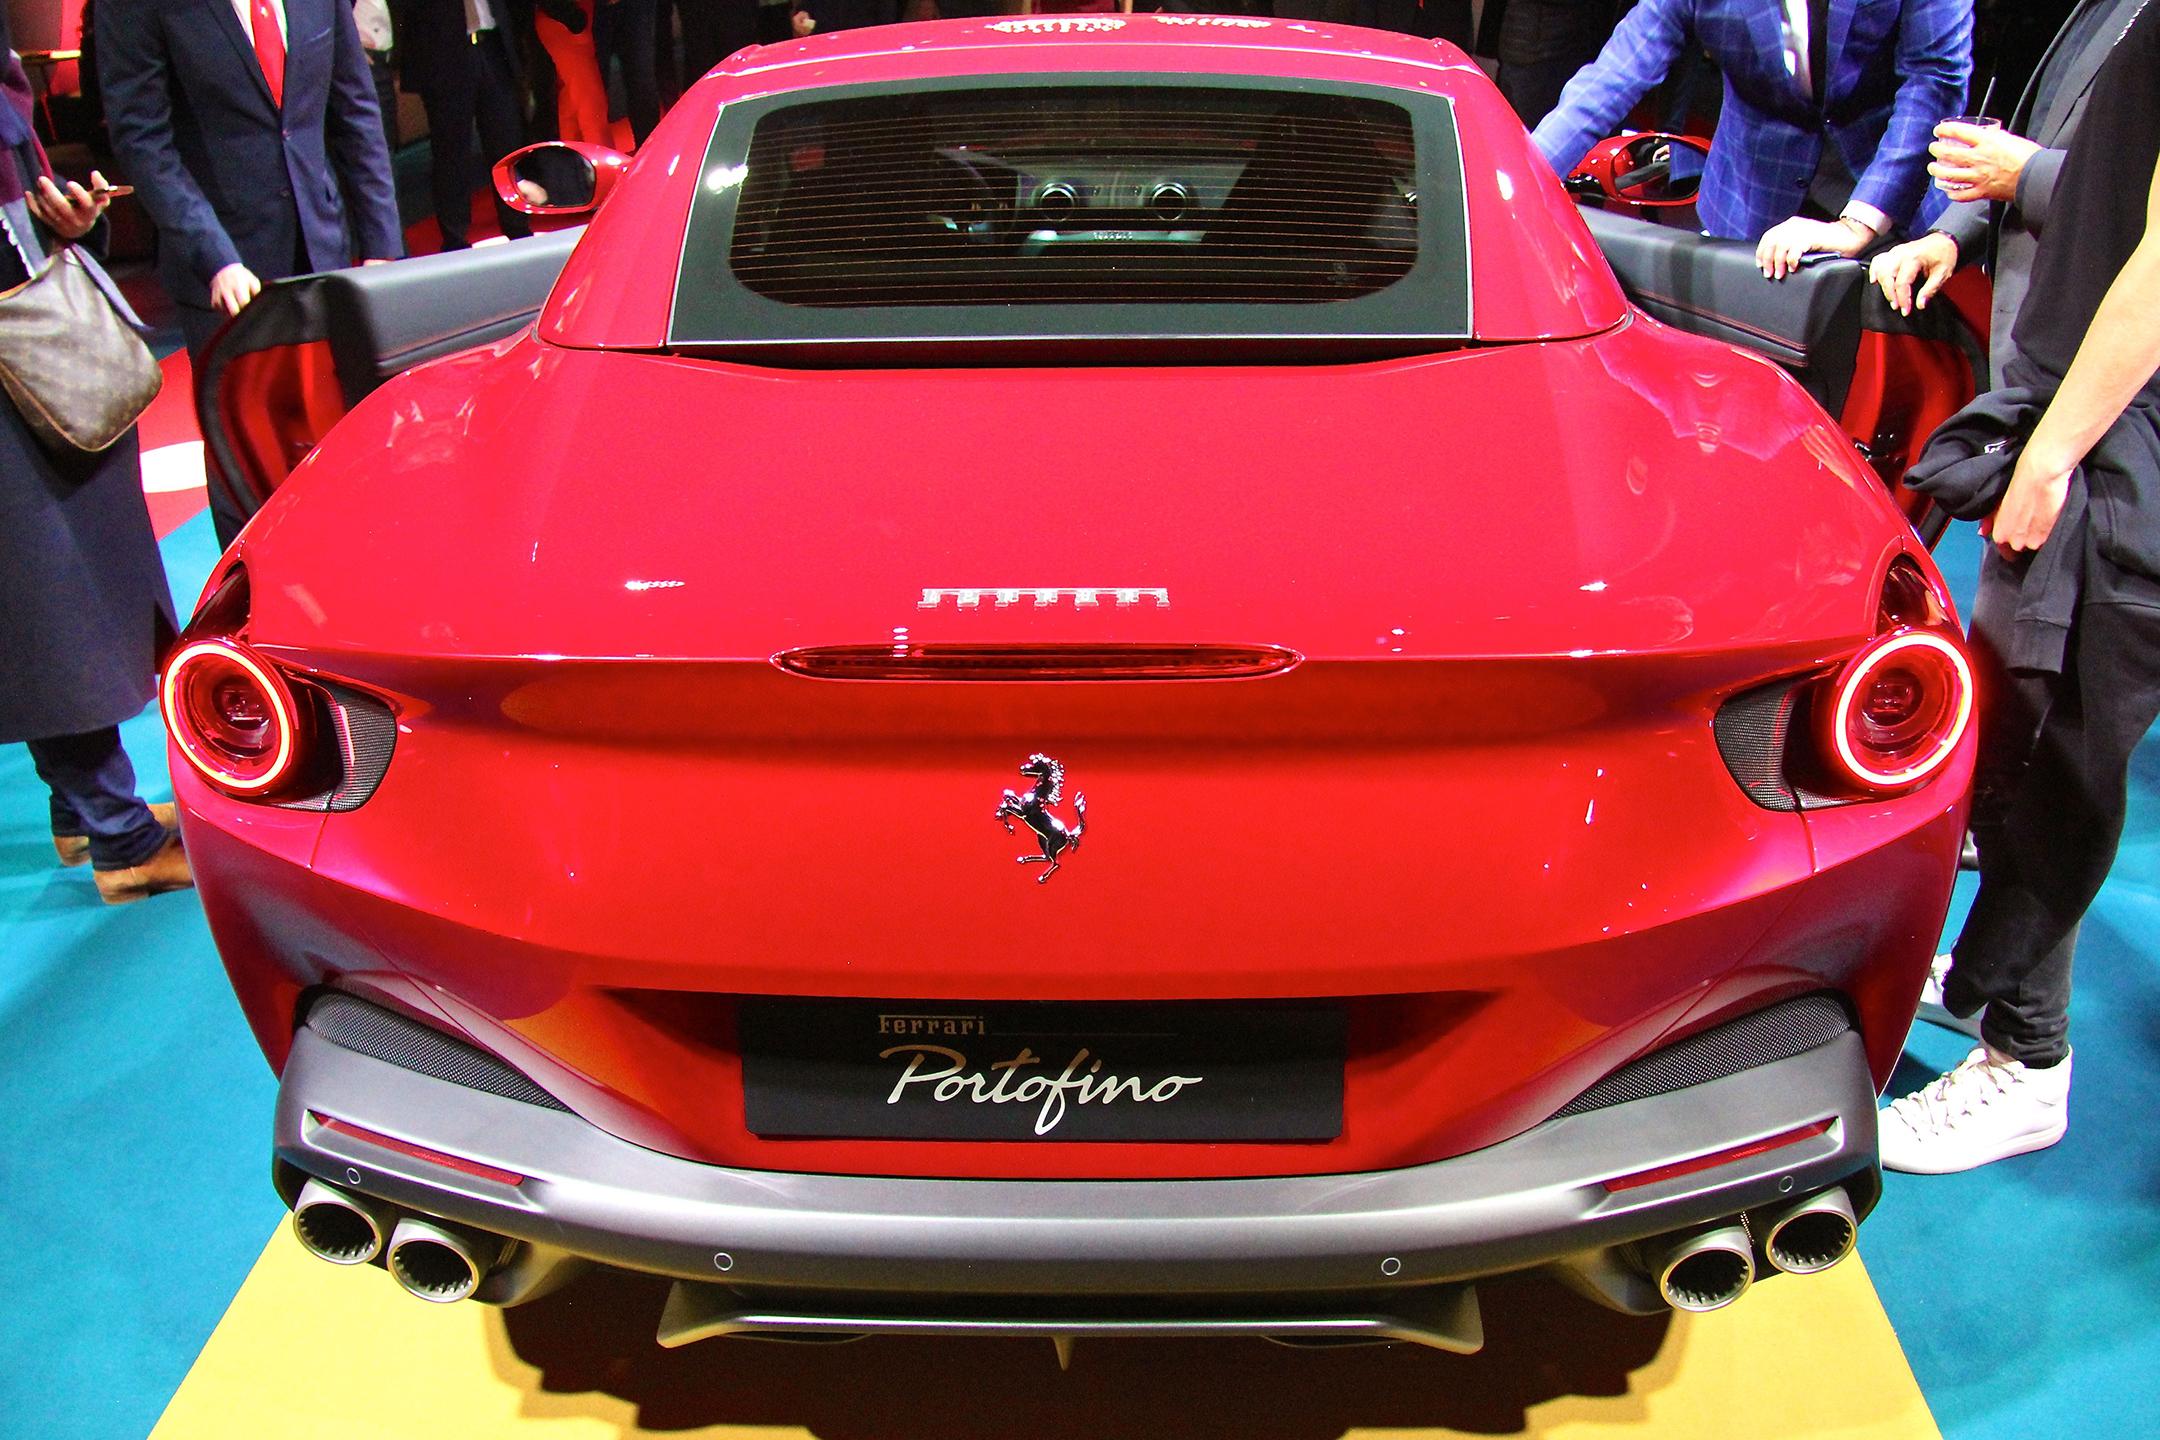 Ferrari Portofino - 2017 - rear / arrière - présentation Ferrari France - photo Ludo Ferrari